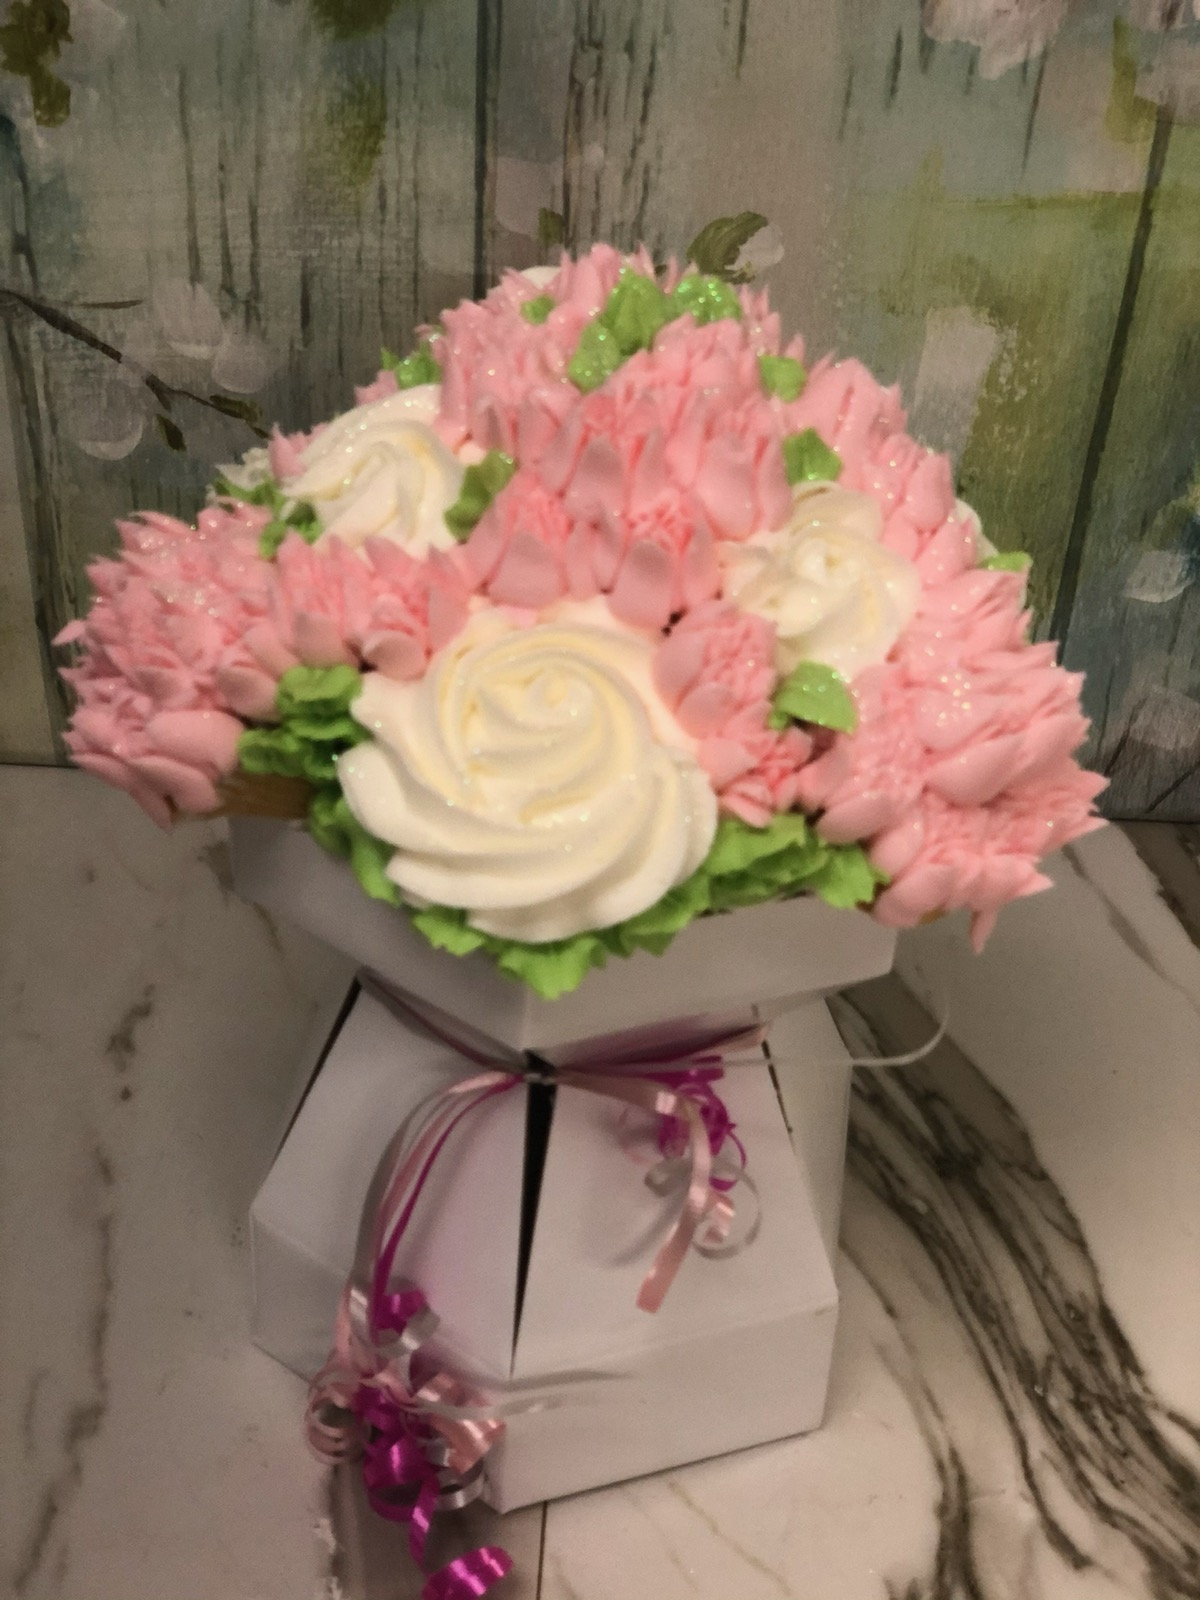 Cupcakes Bouquet (12 Cupcakes)